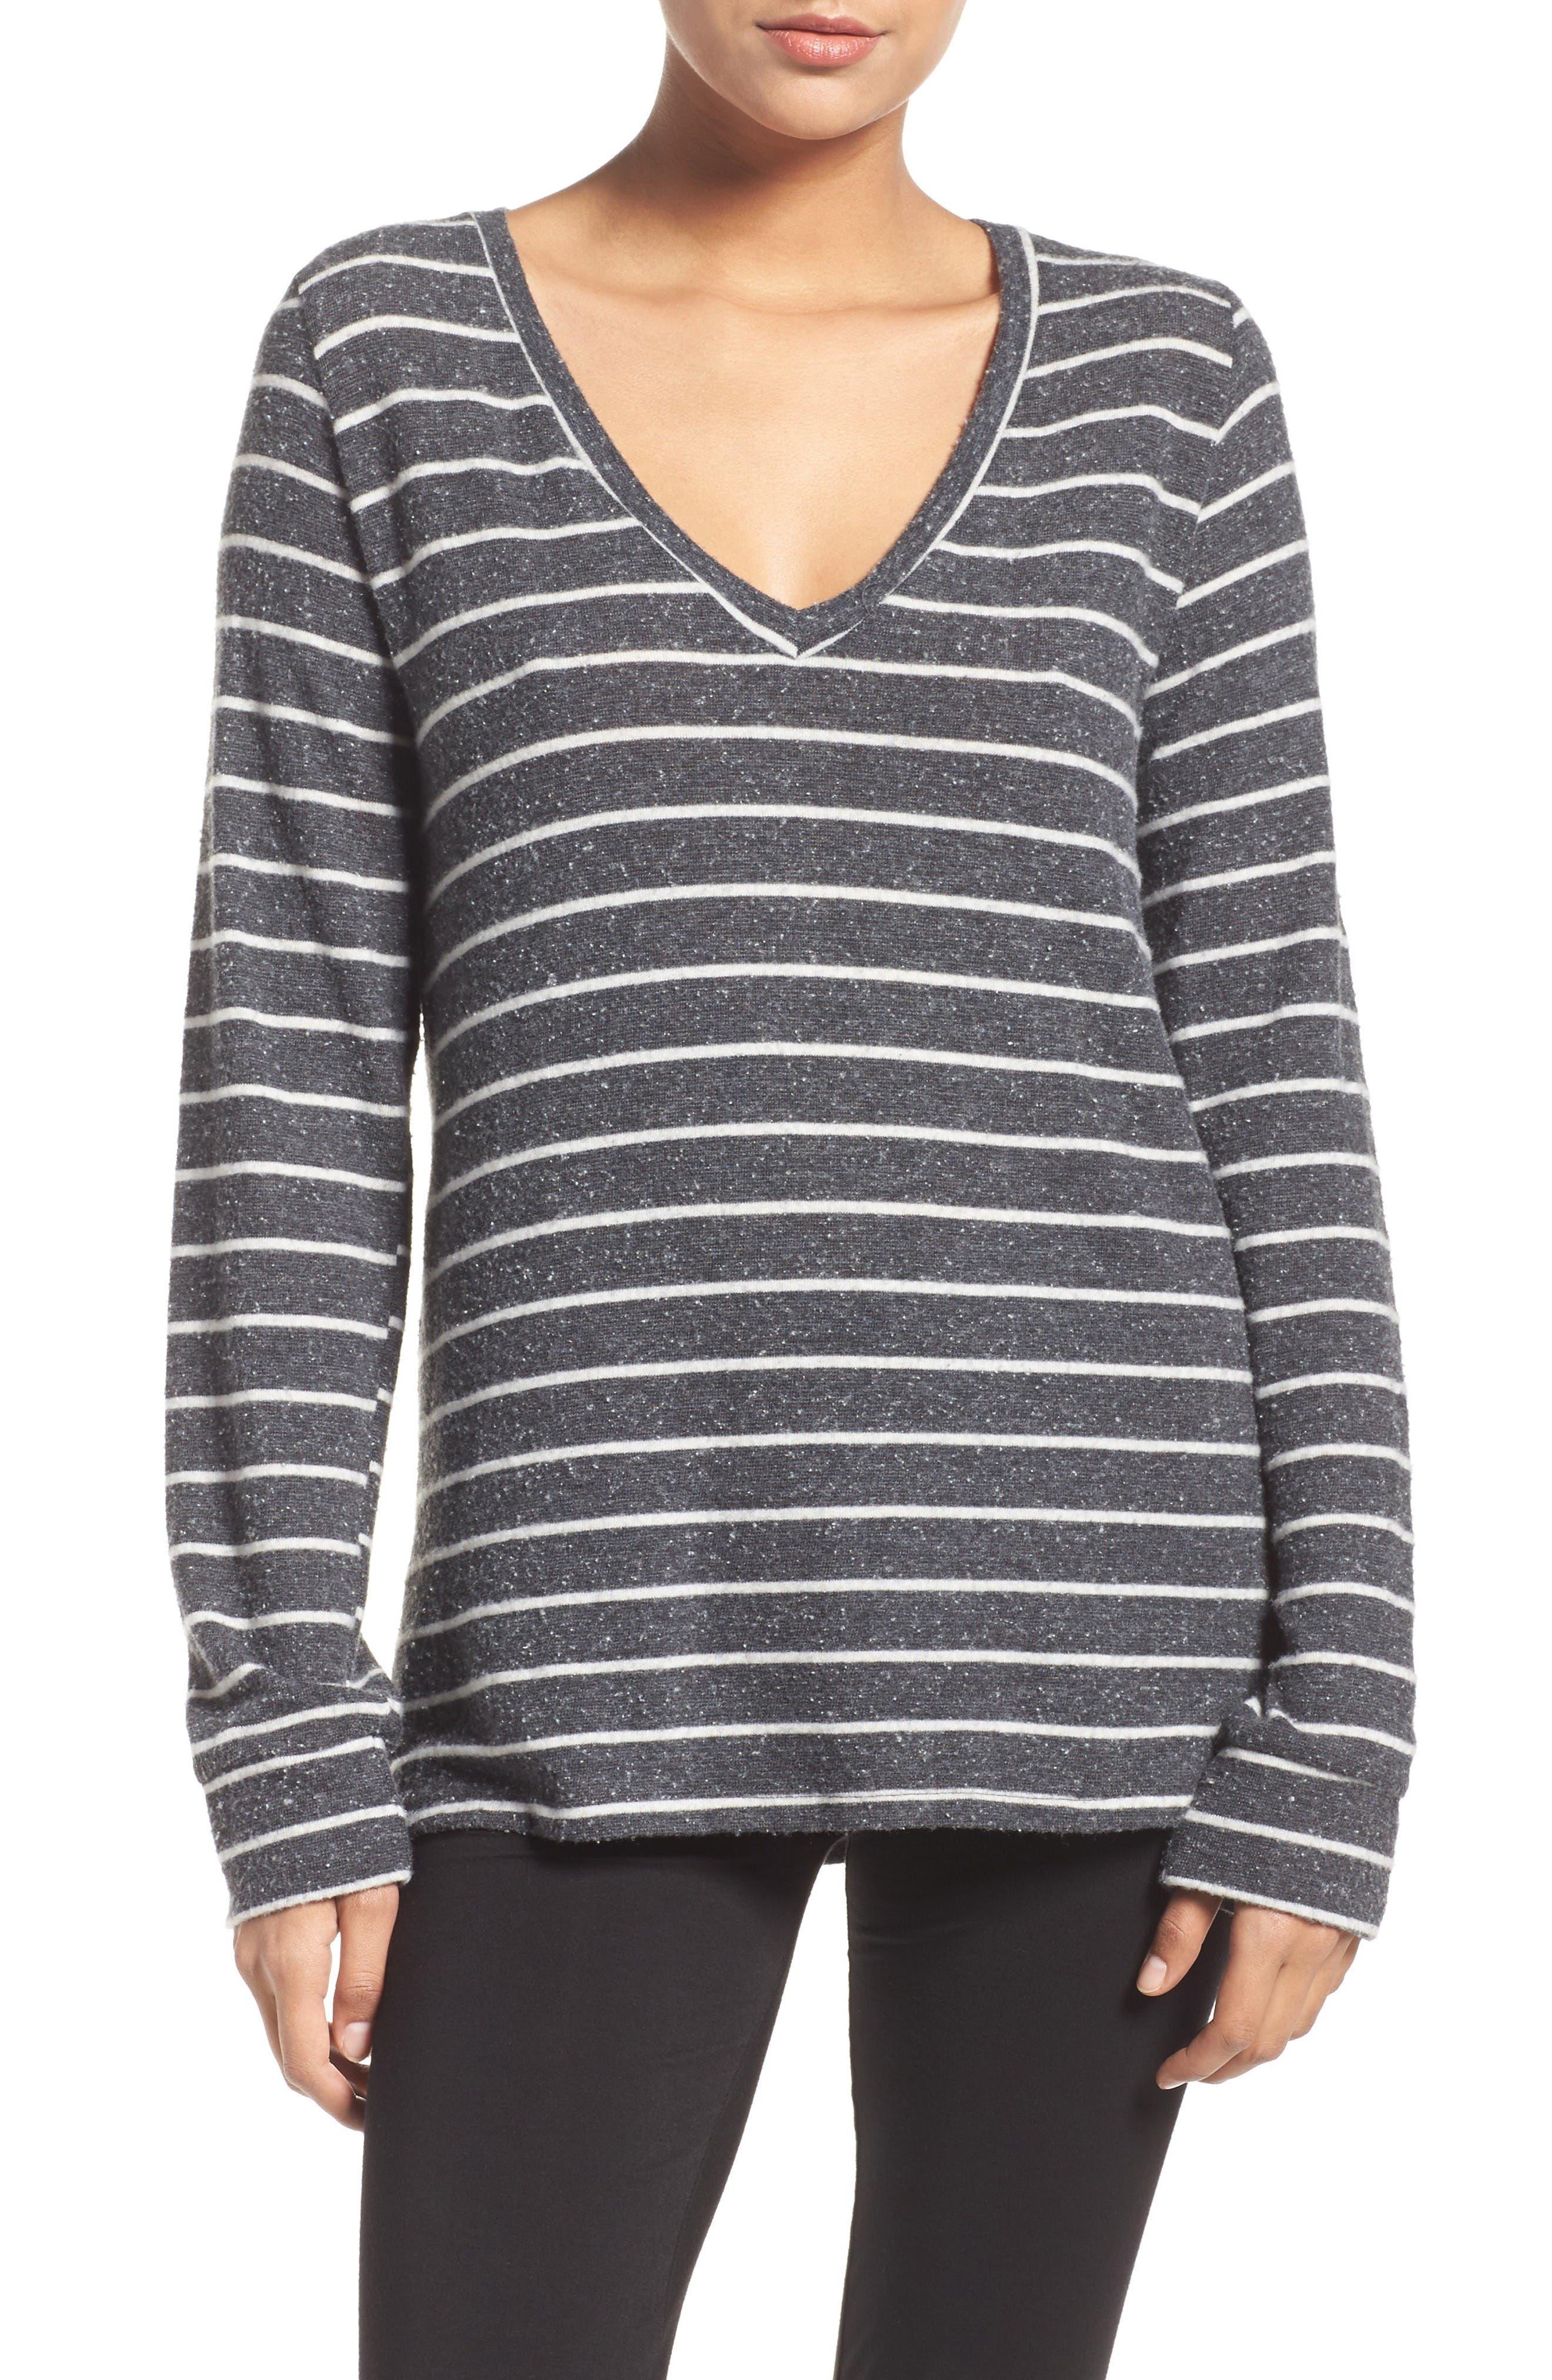 Wicus Lounge Top,                         Main,                         color, Black/ White Stripe